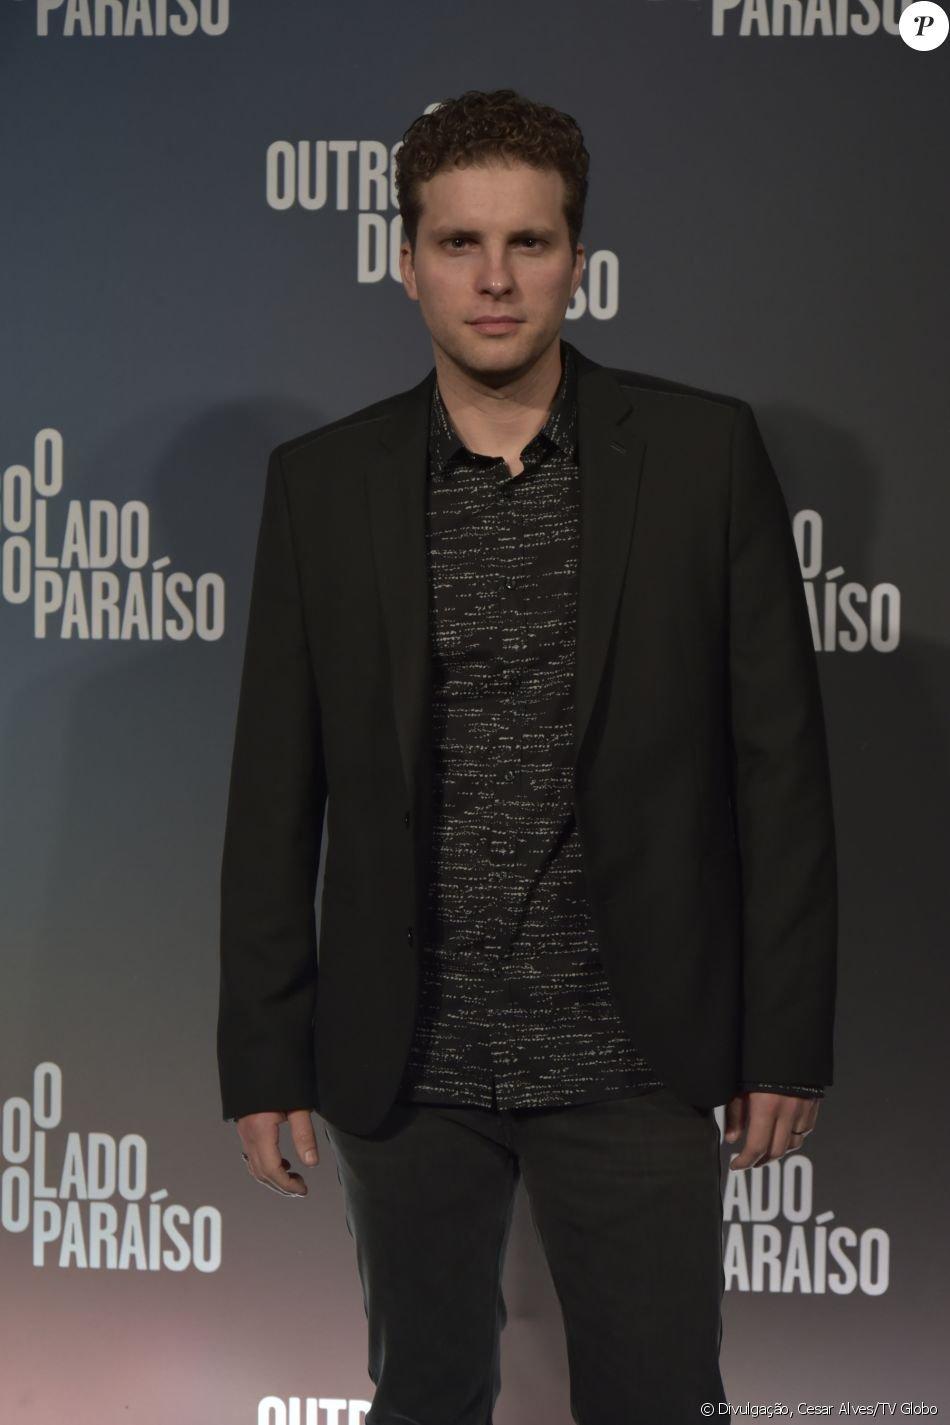 Thiago Fragoso será o novo mocinho da novela 'O Outro Lado do Paraíso'. O advogado Patrick entra na segunda fase da trama, em meados de dezembro